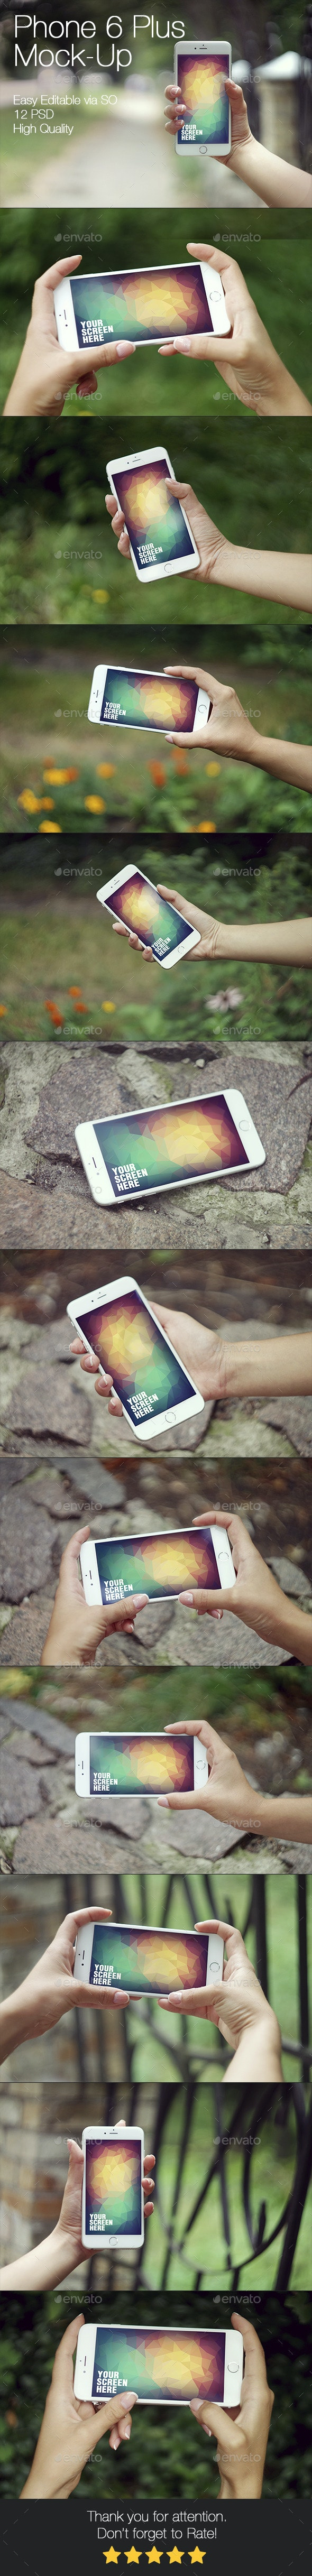 Phone 6 Plus Mockup - Mobile Displays